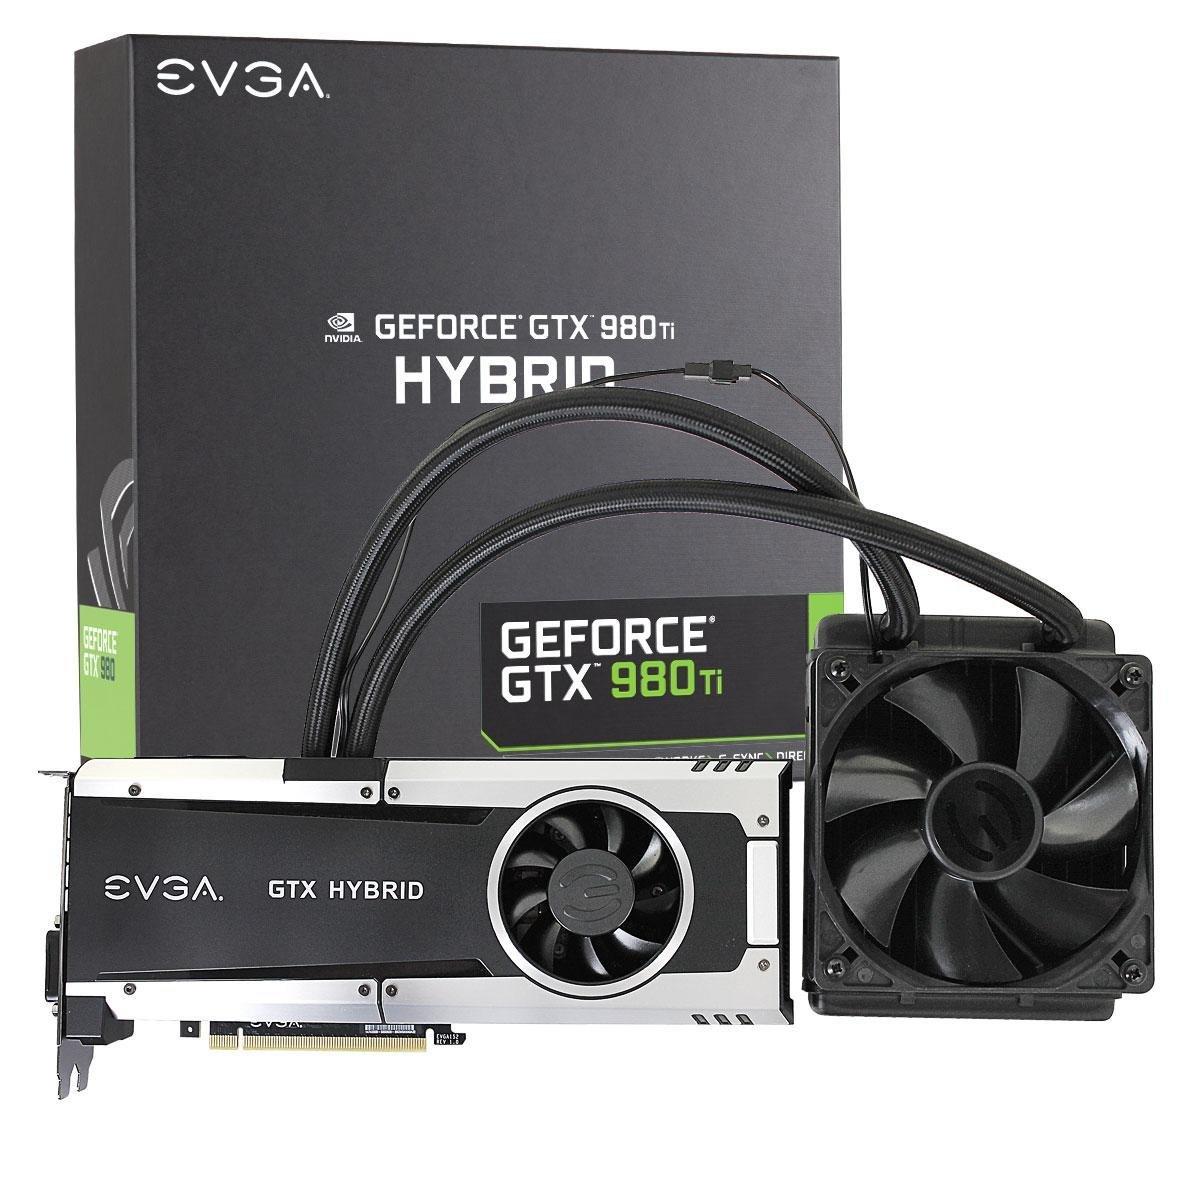 Amazon: tarjeta de video EVGA GeForce GTX 980ti Hybrid, 6 GB GDDR5